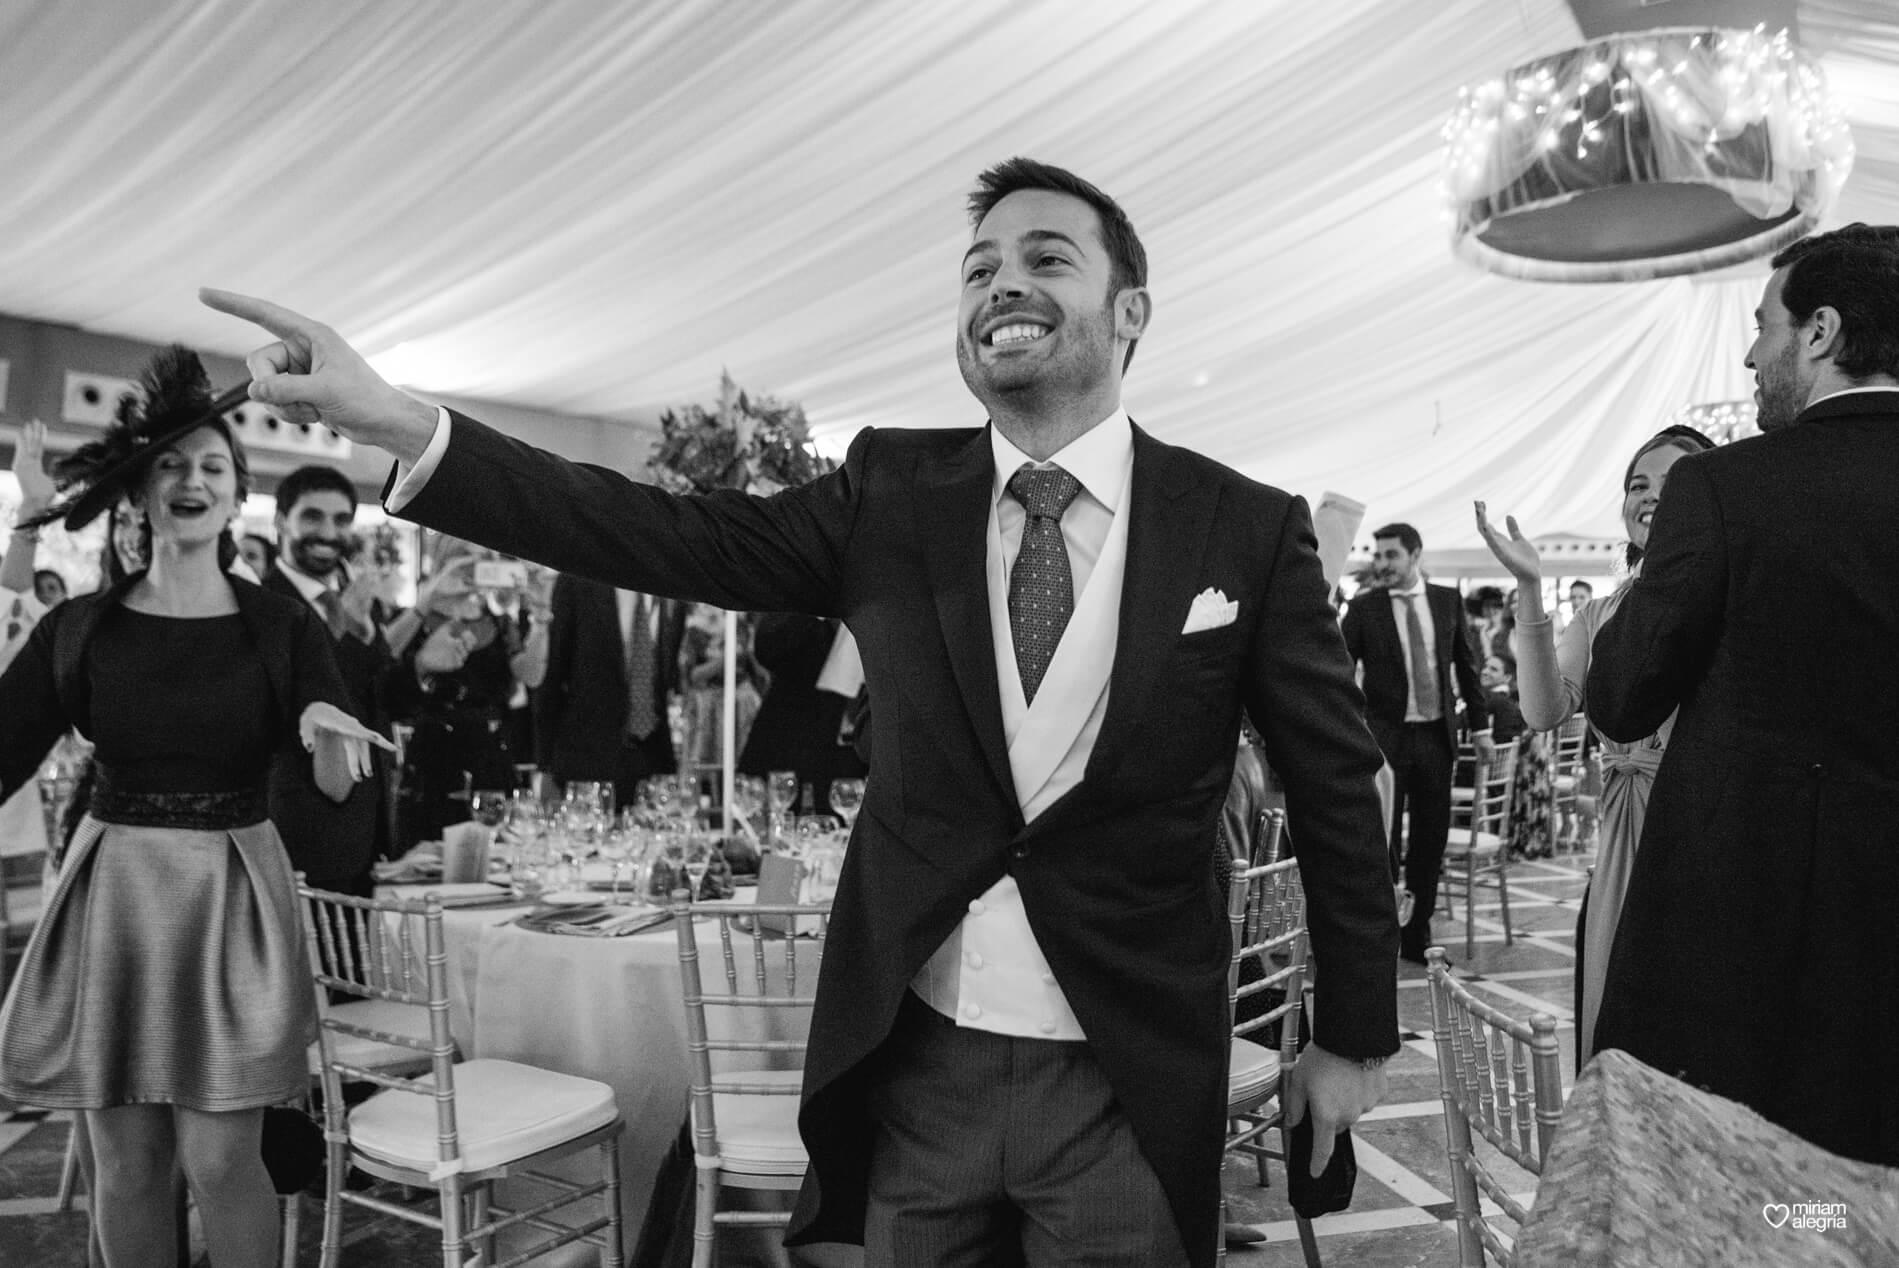 vestido-de-novia-paula-del-vas-miriam-alegria-fotografos-boda-murcia-186